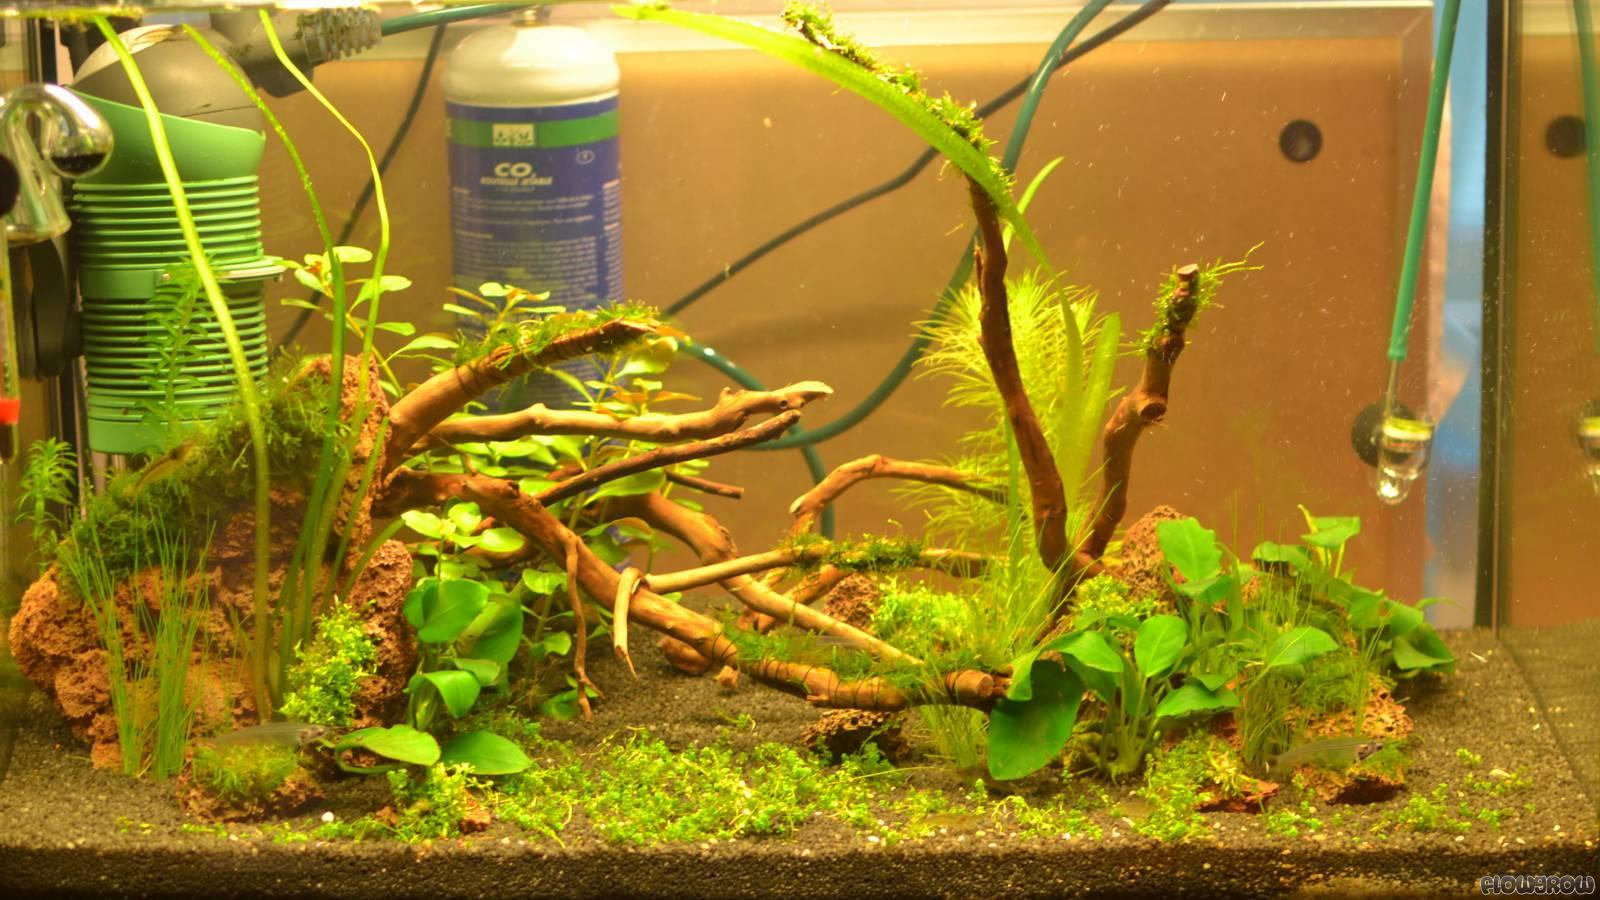 ying yang flowgrow aquascape aquarium database. Black Bedroom Furniture Sets. Home Design Ideas